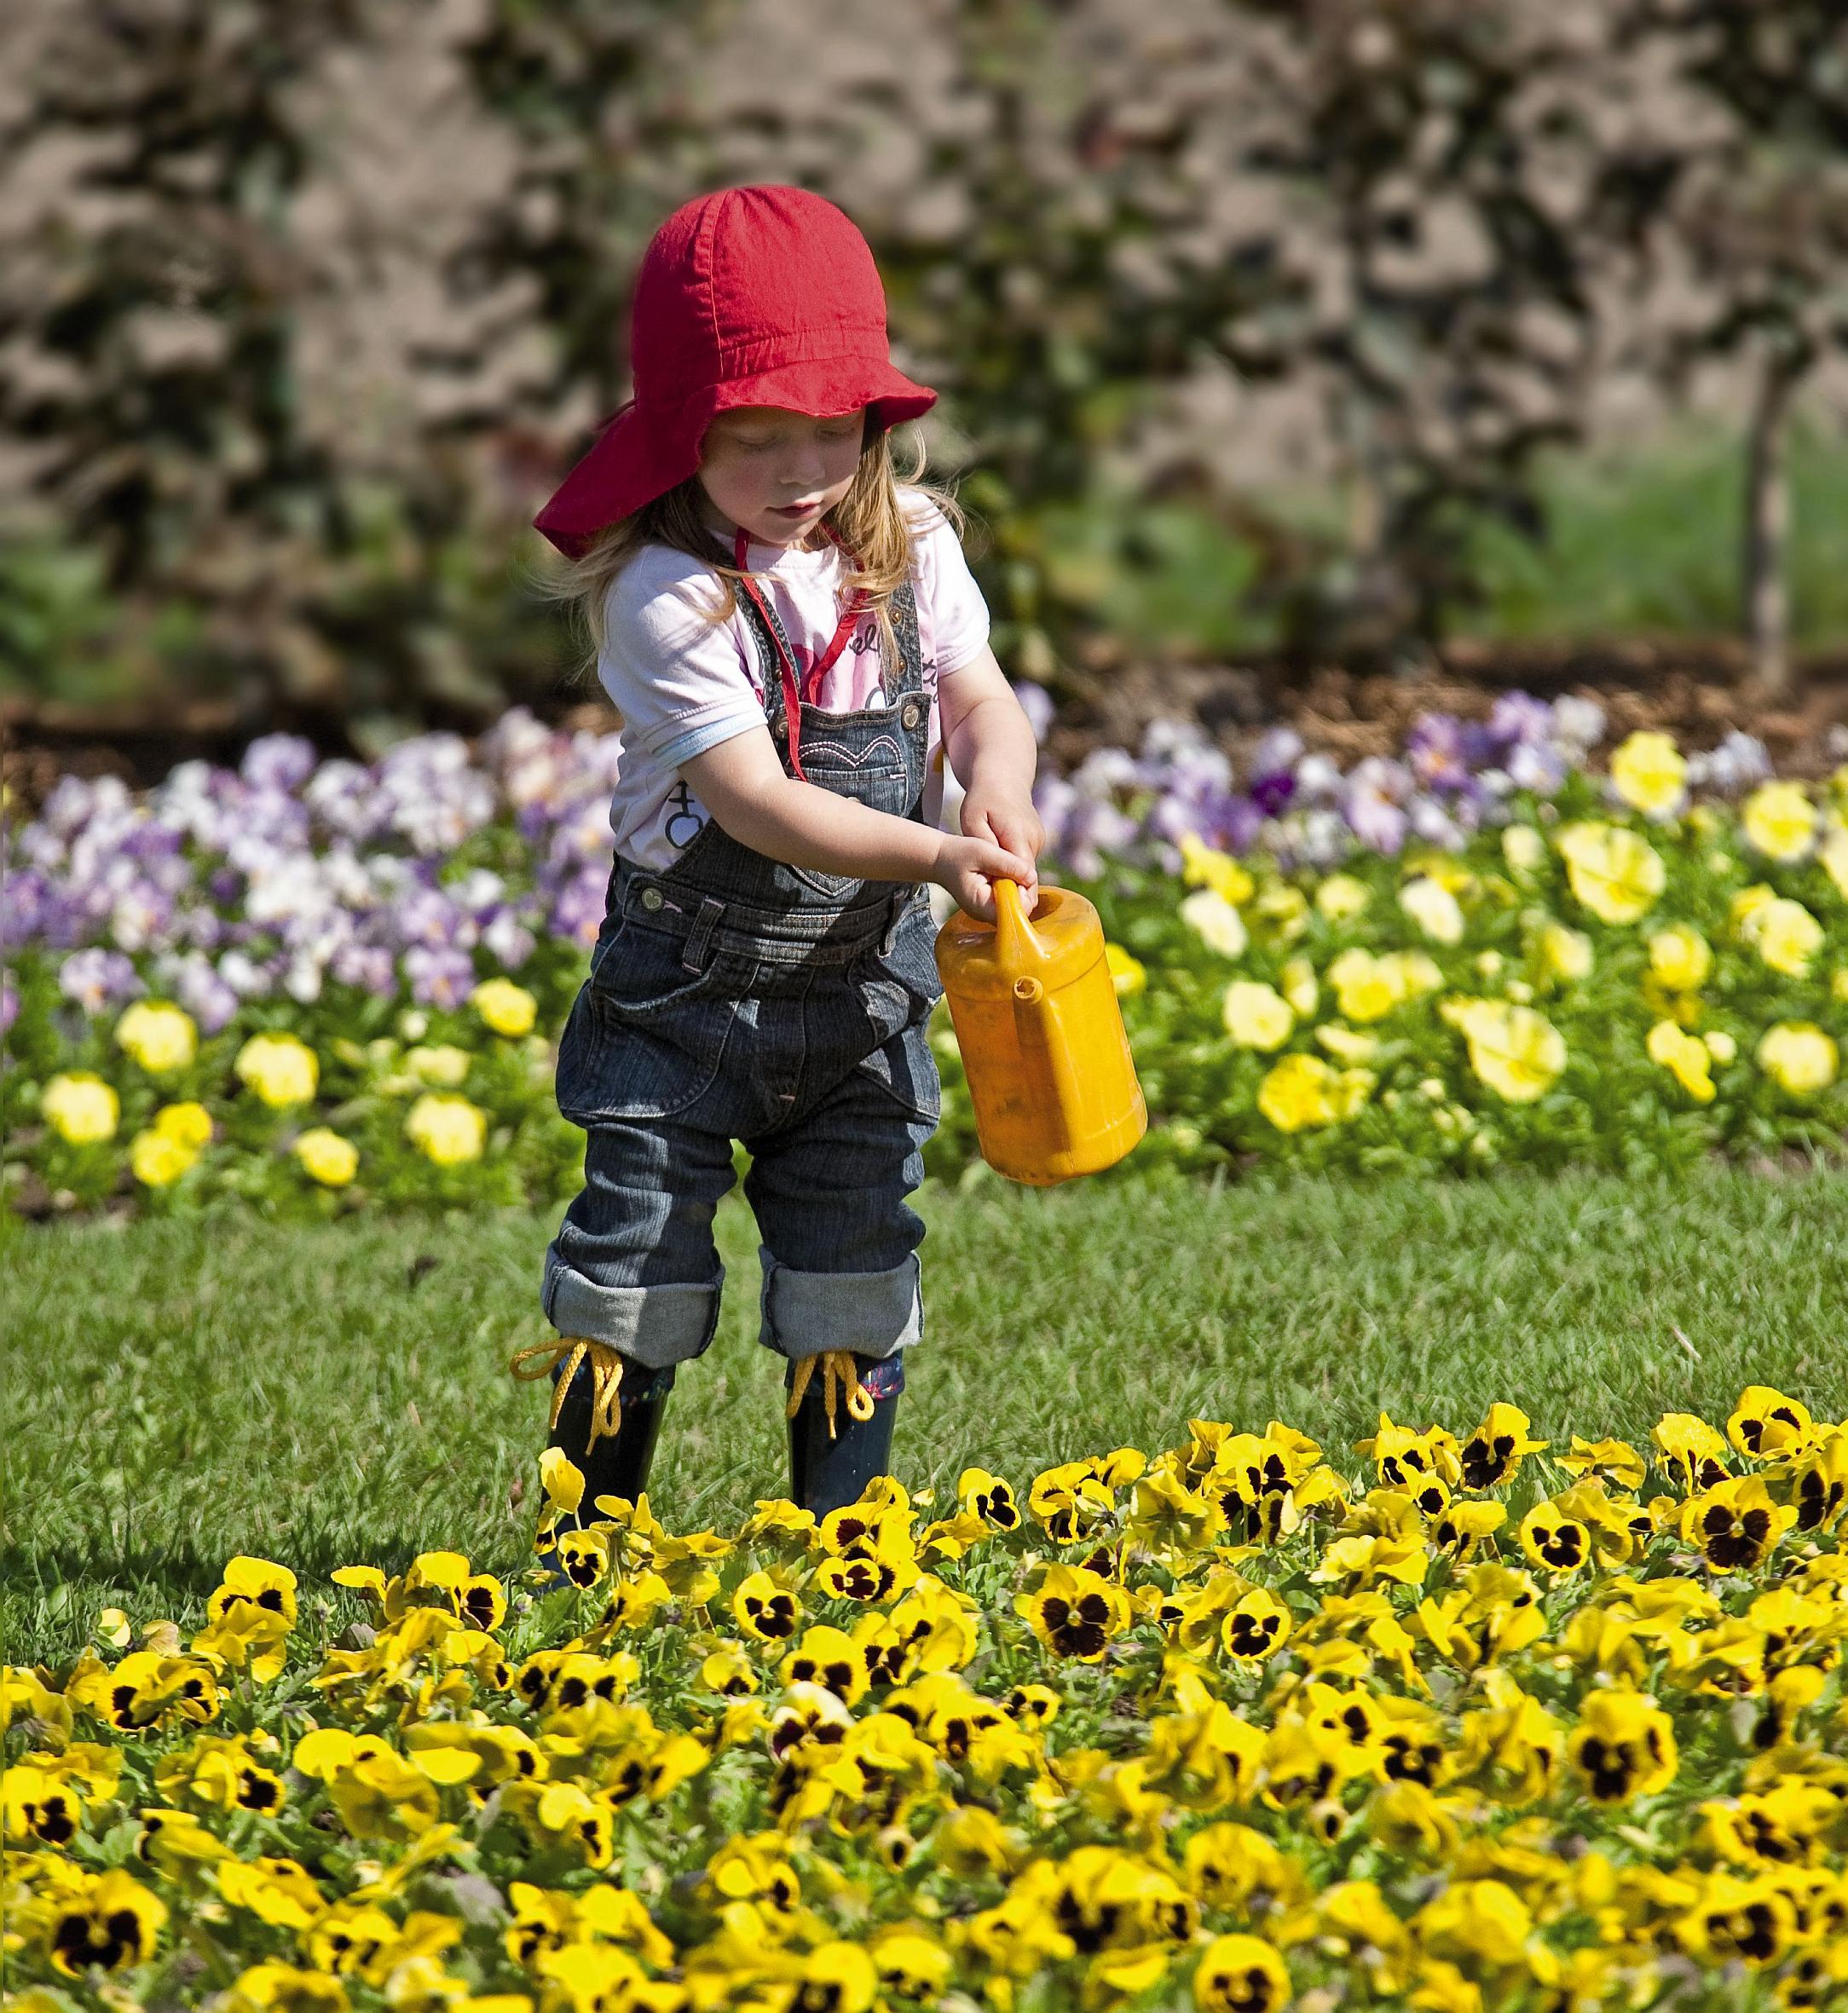 Berühmt Primeln & Co – Frühjahrsblüher bringen Farbe in den Garten - Das &UG_31